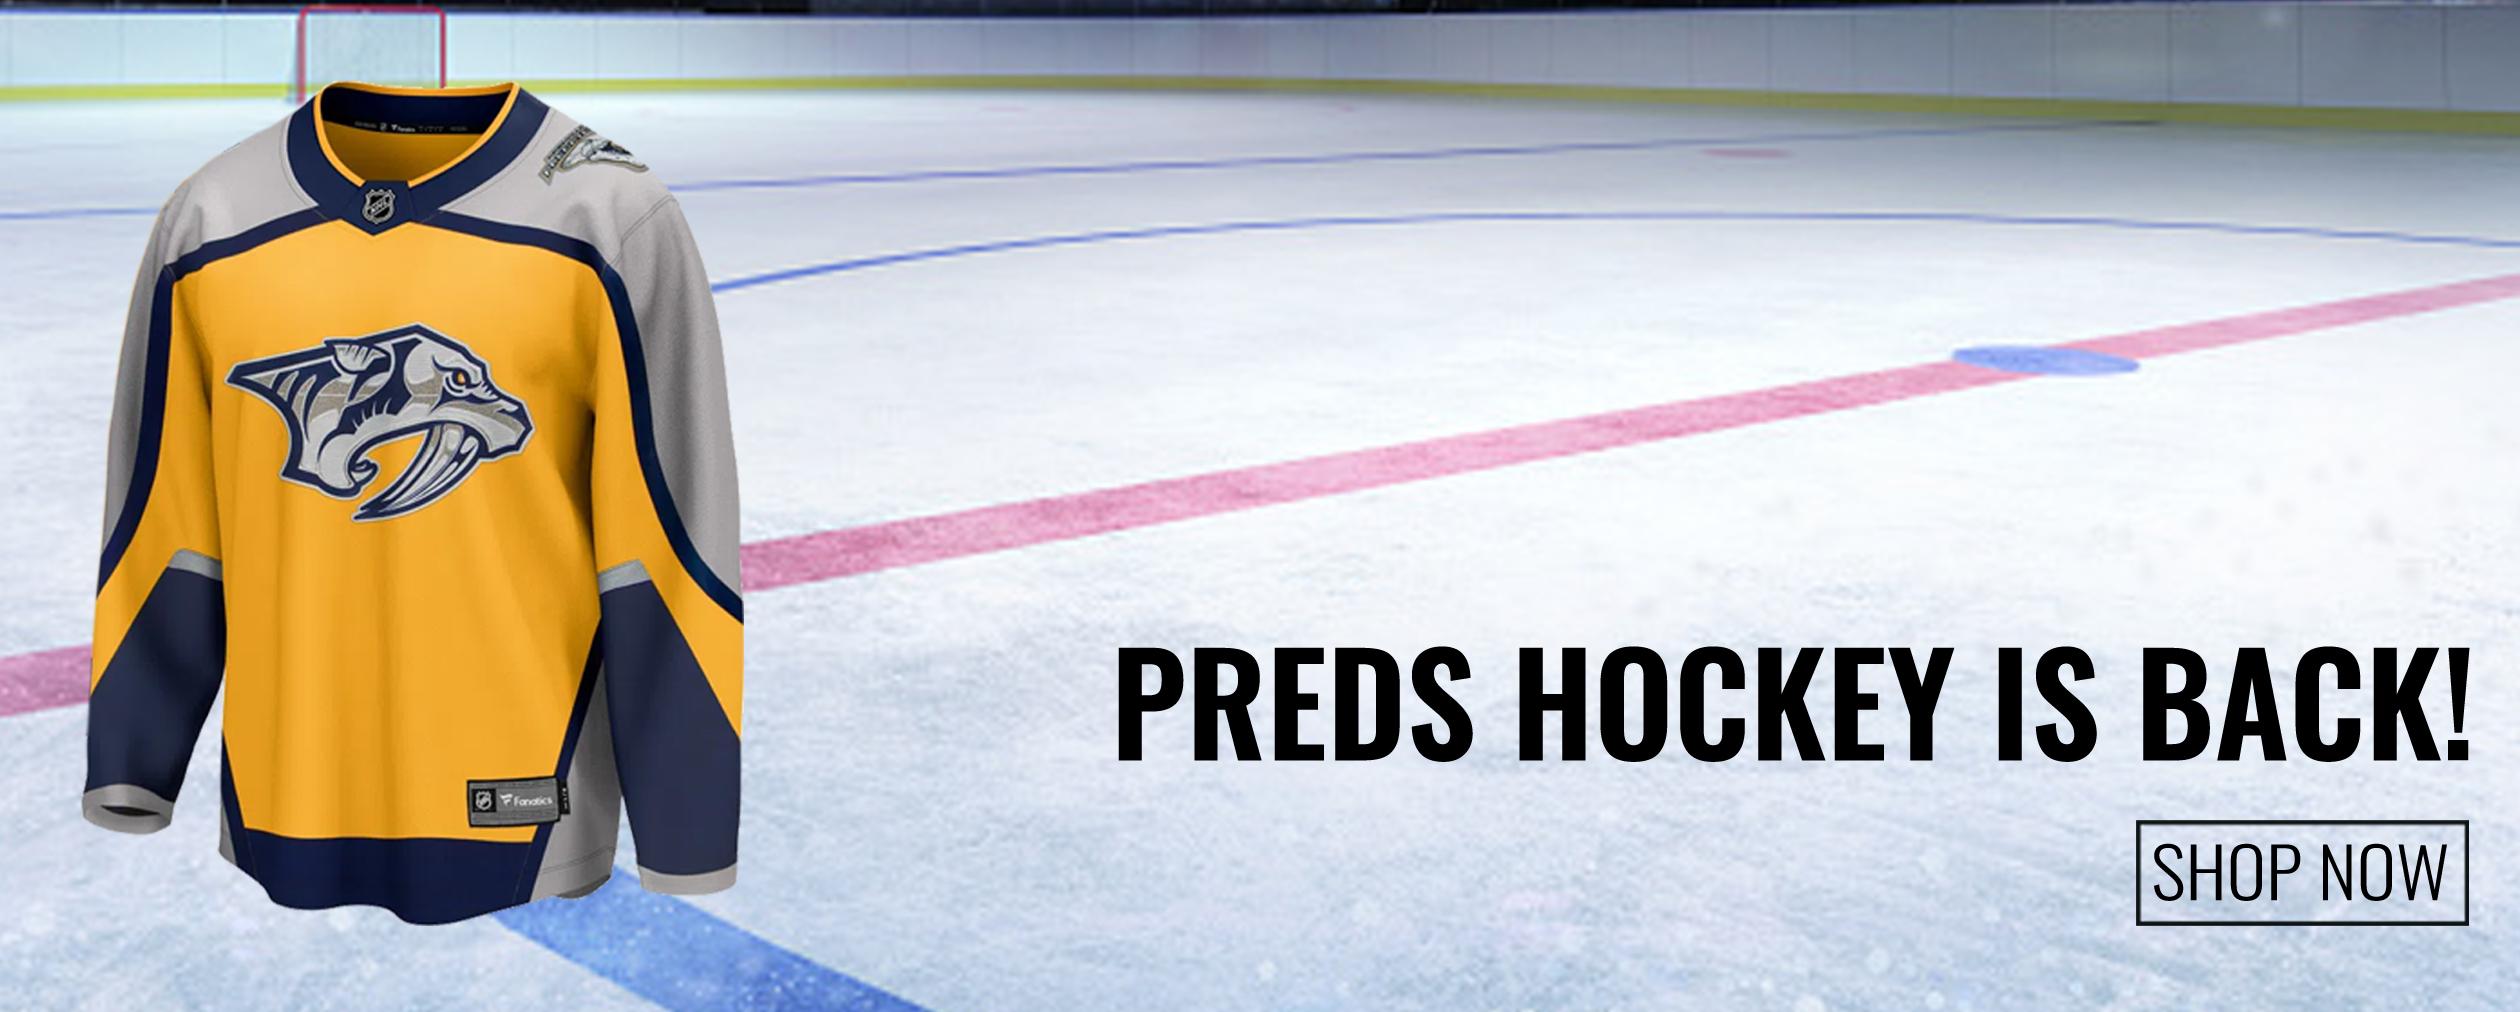 Nashville Predators are back!